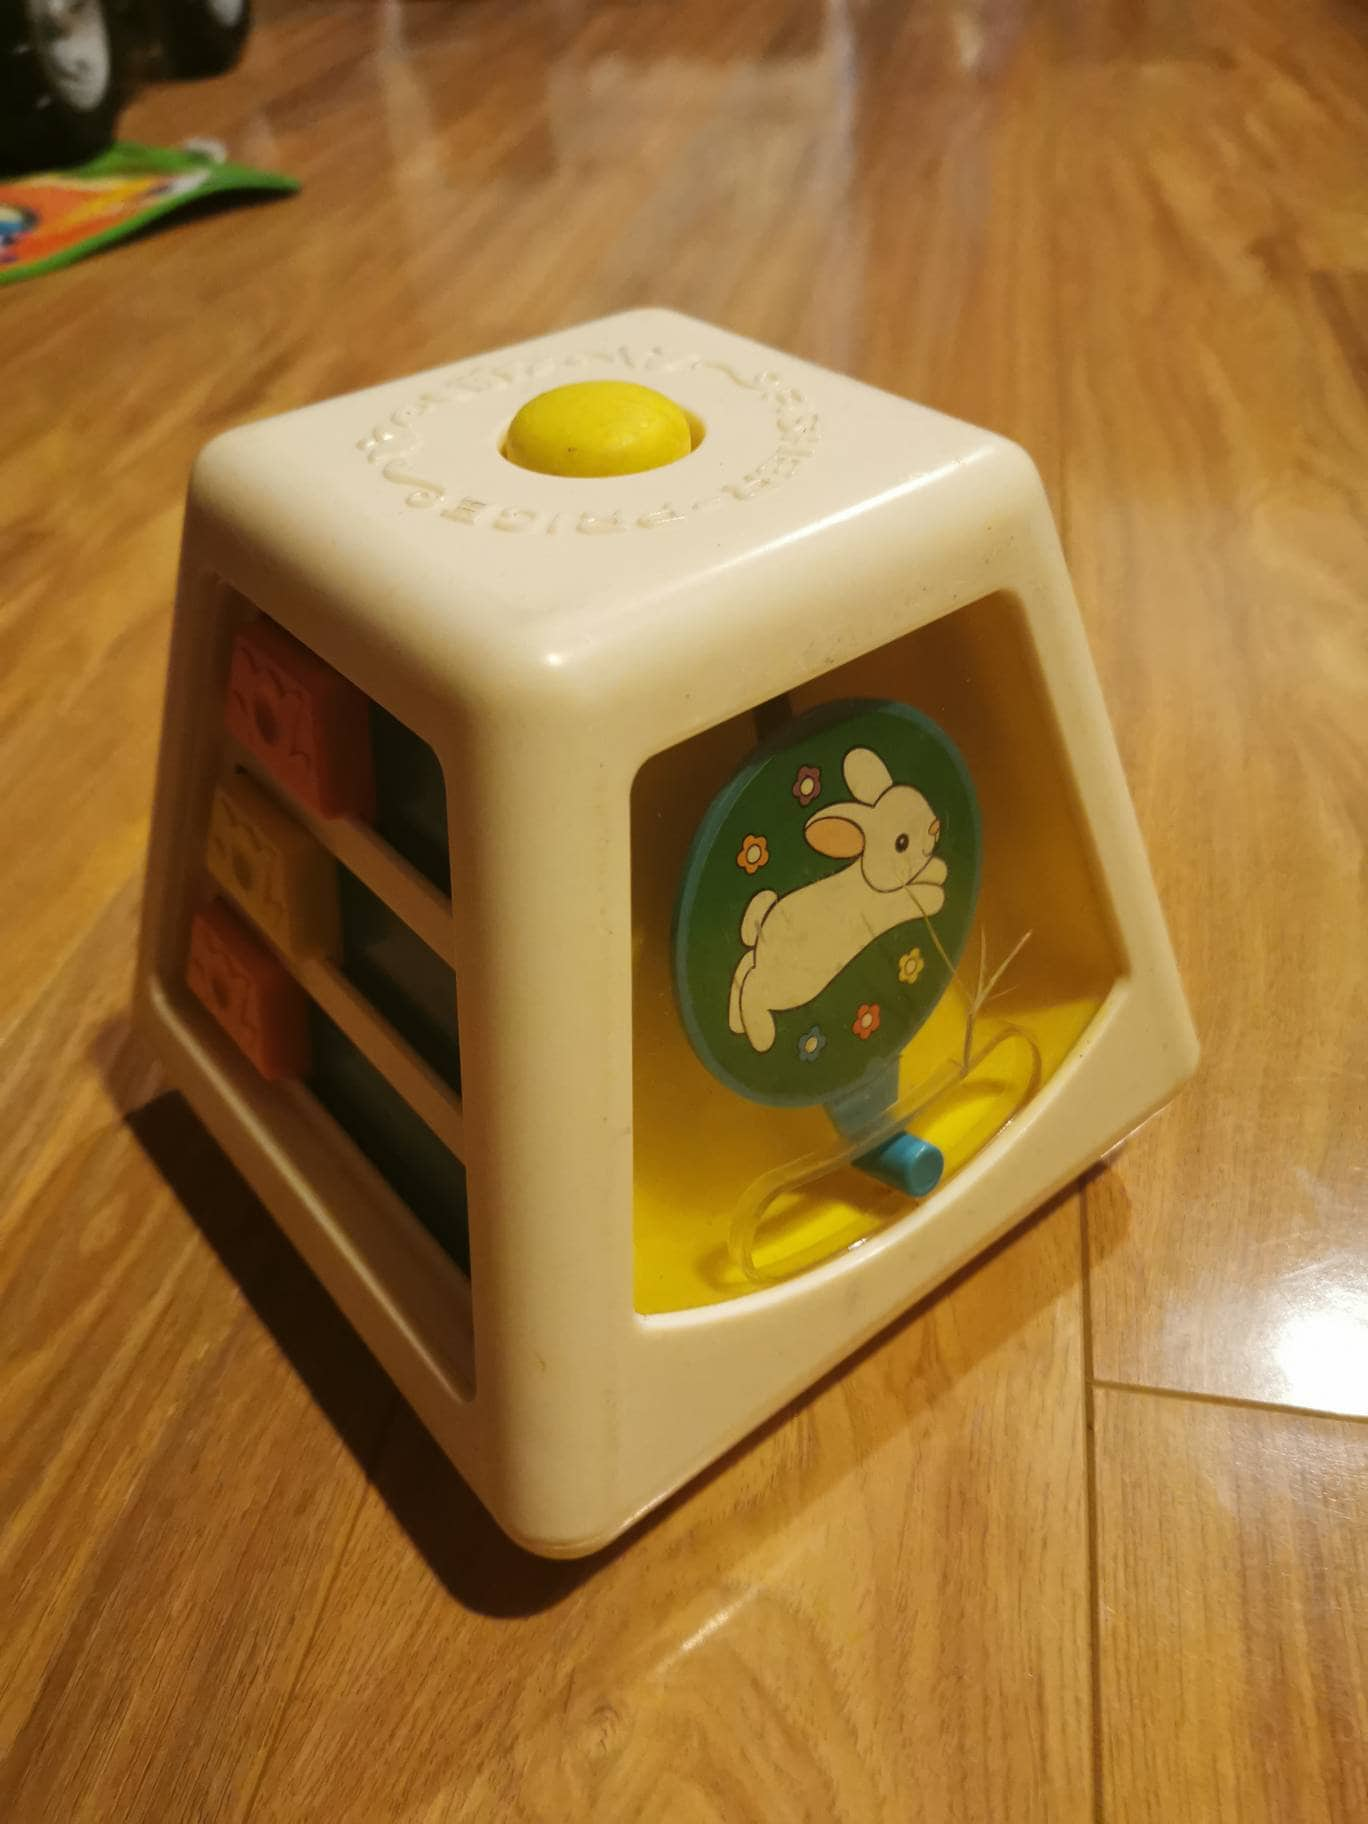 Vintage 1978 fisher price baby/toddler toy image 2